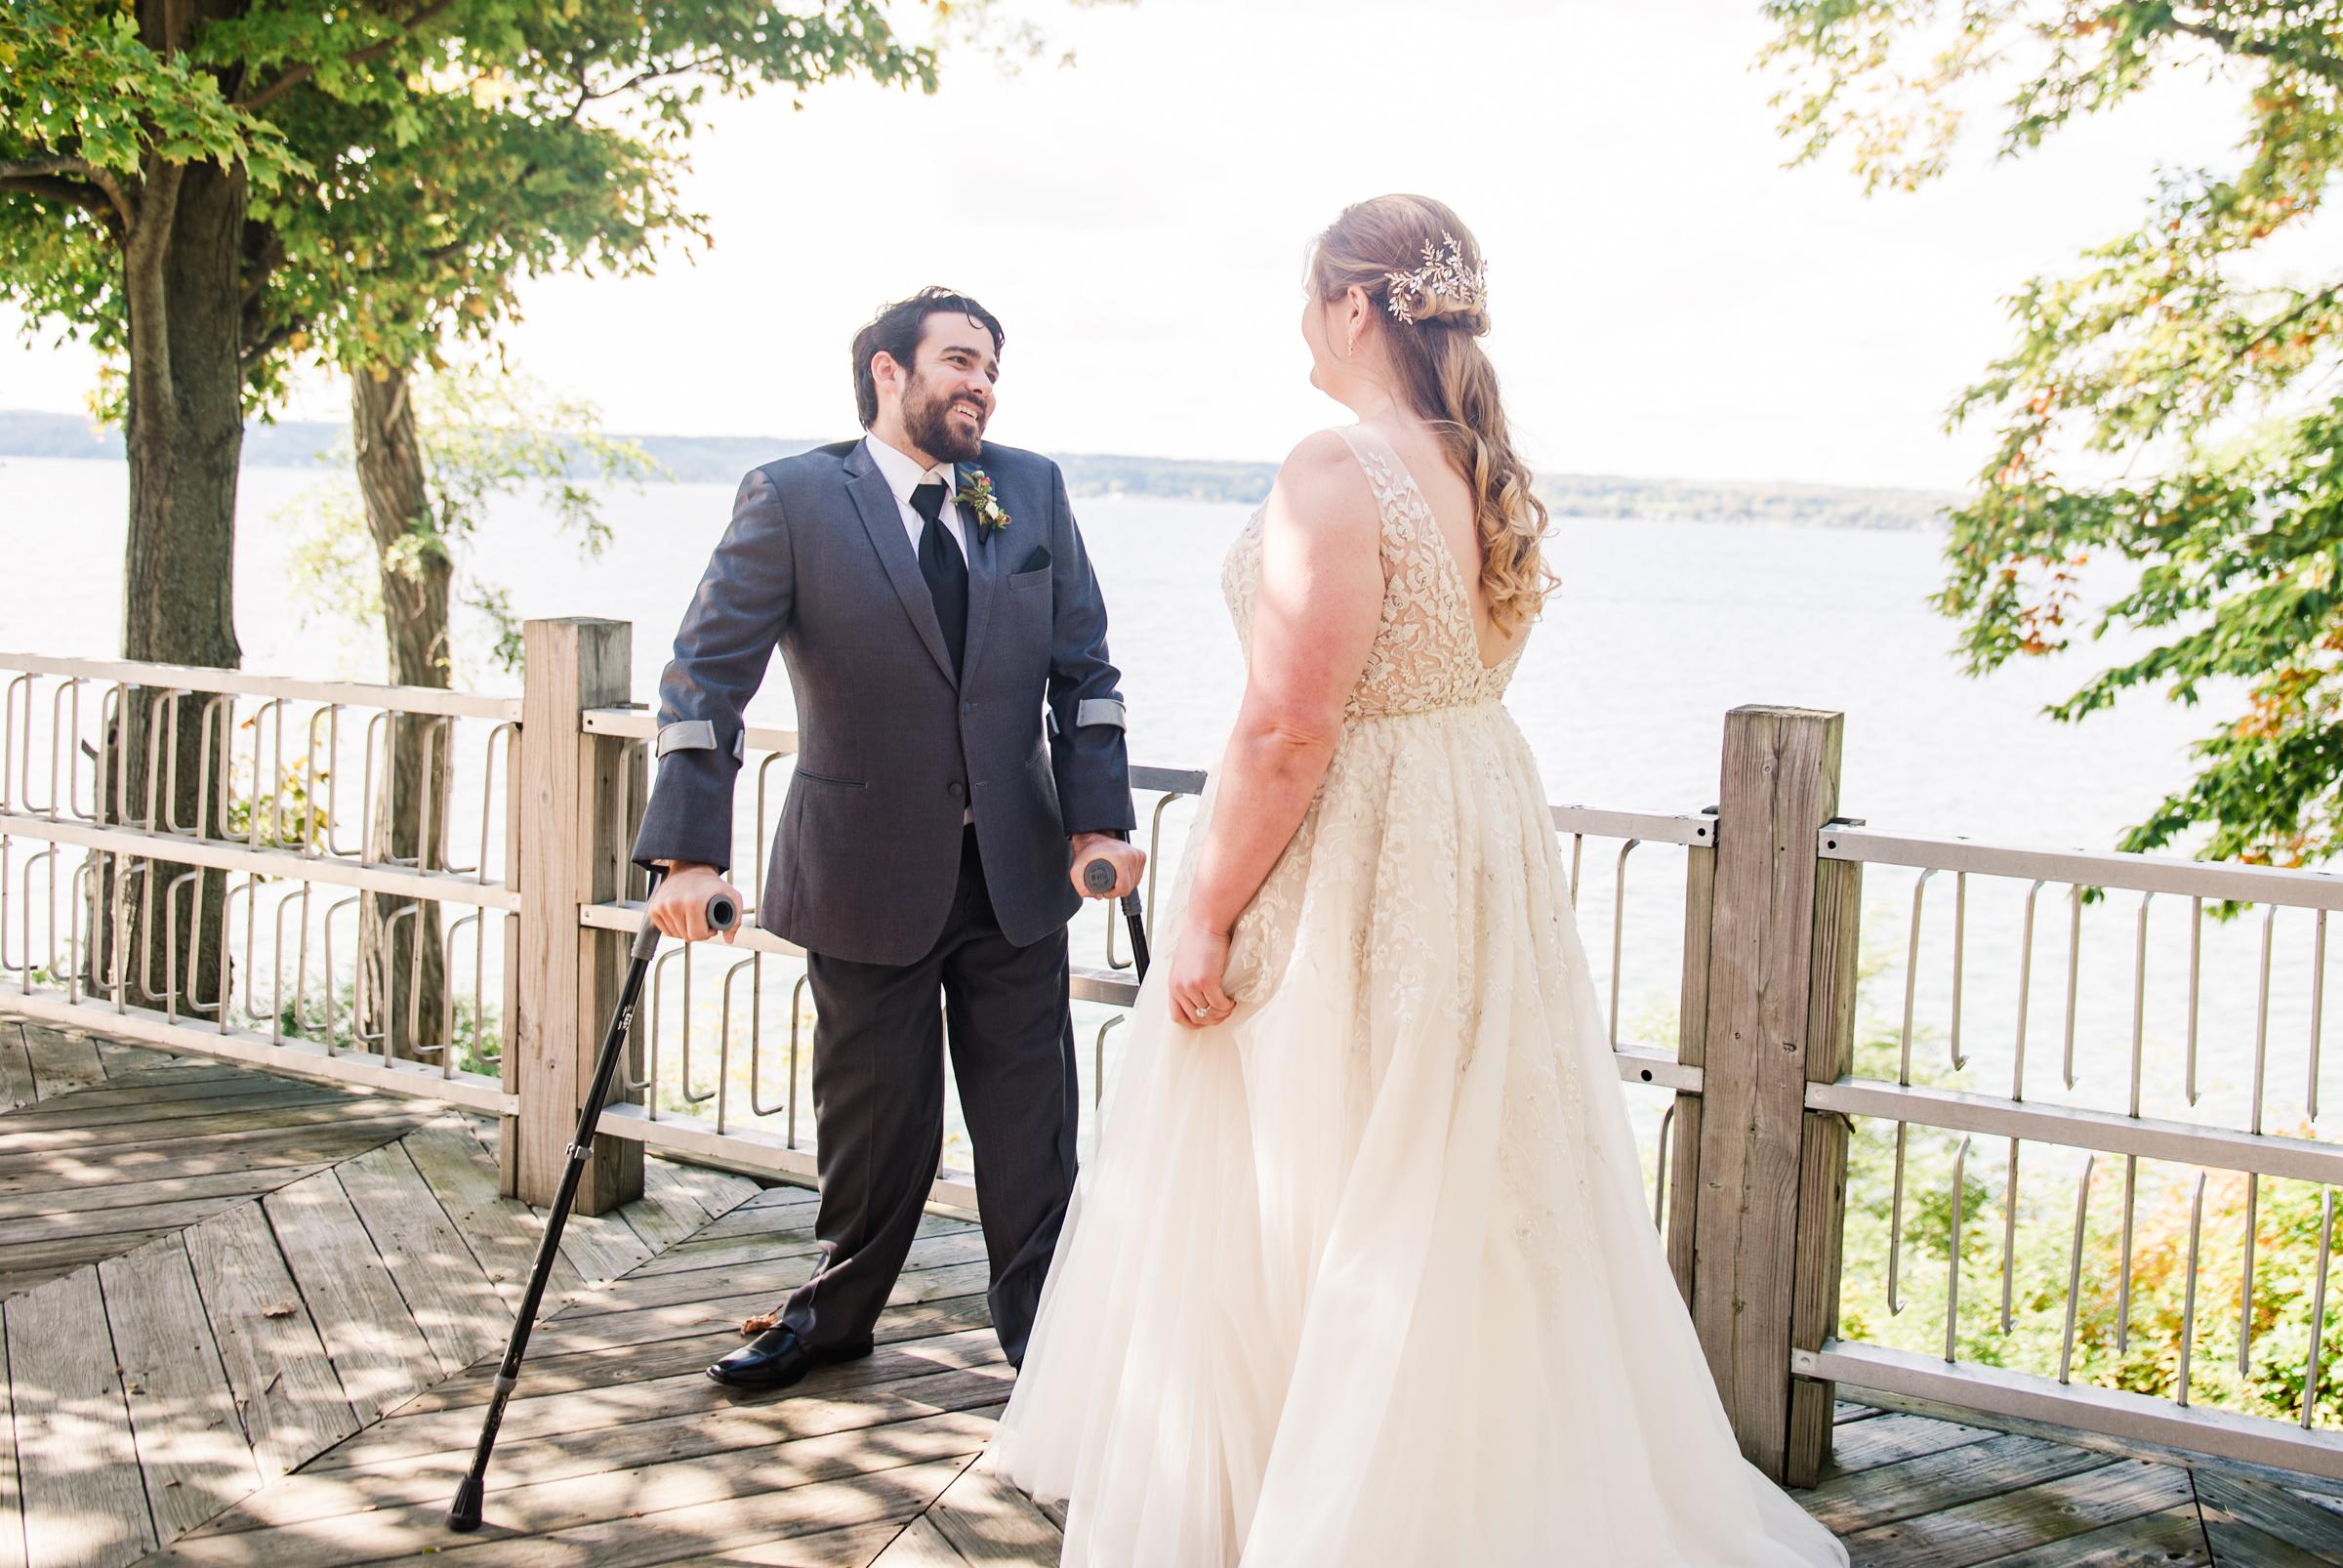 Zugibe_Vineyards_Finger_Lakes_Wedding_JILL_STUDIO_Rochester_NY_Photographer_DSC_3437.jpg